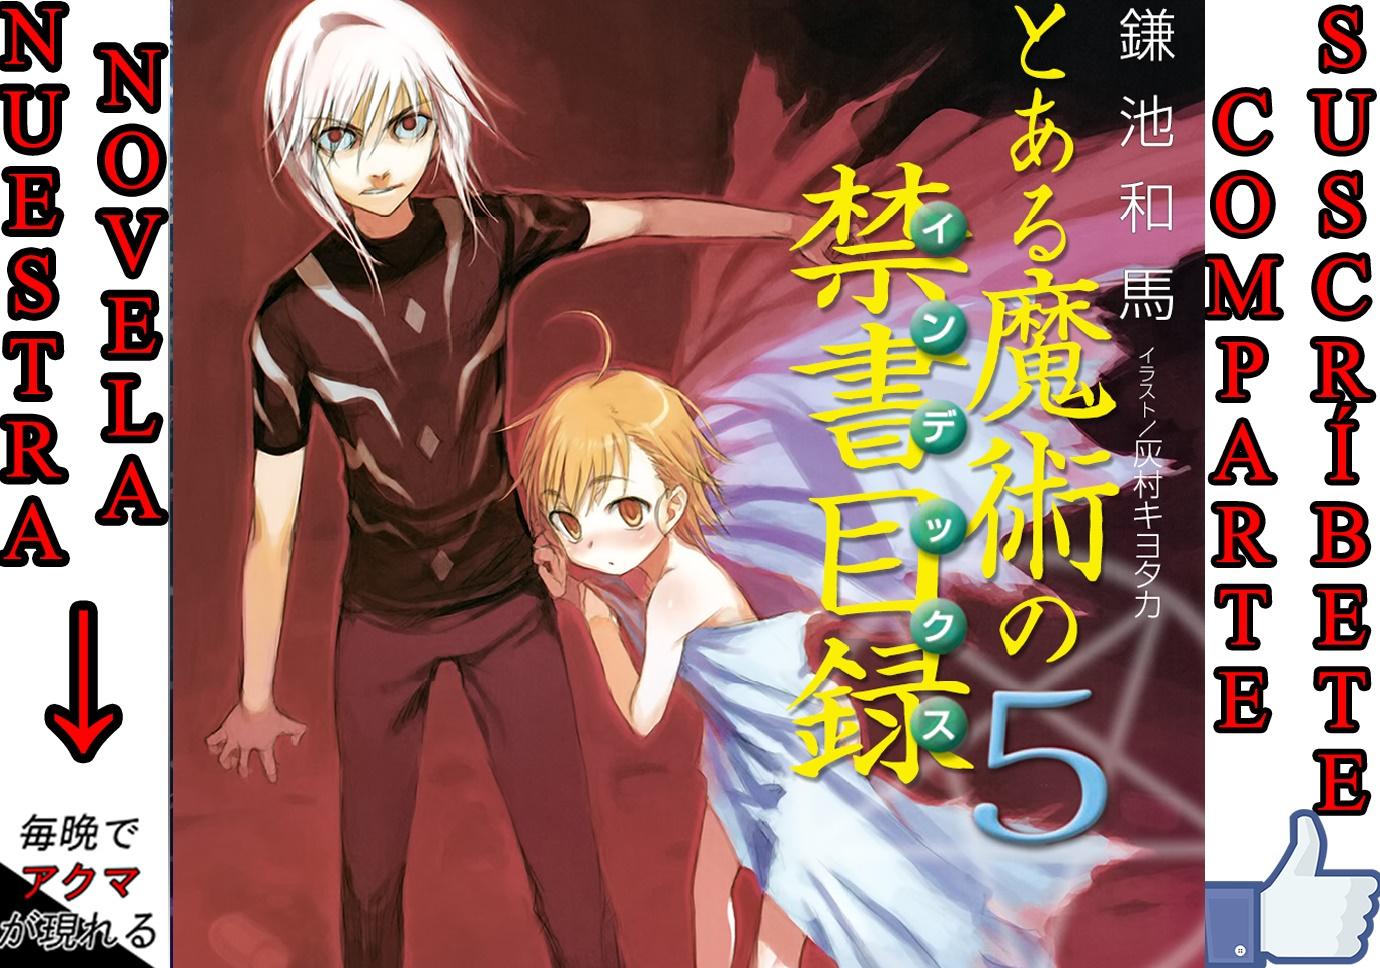 To Aru Majutsu no Index vol  5 (RESEÑA) - Novels & Others